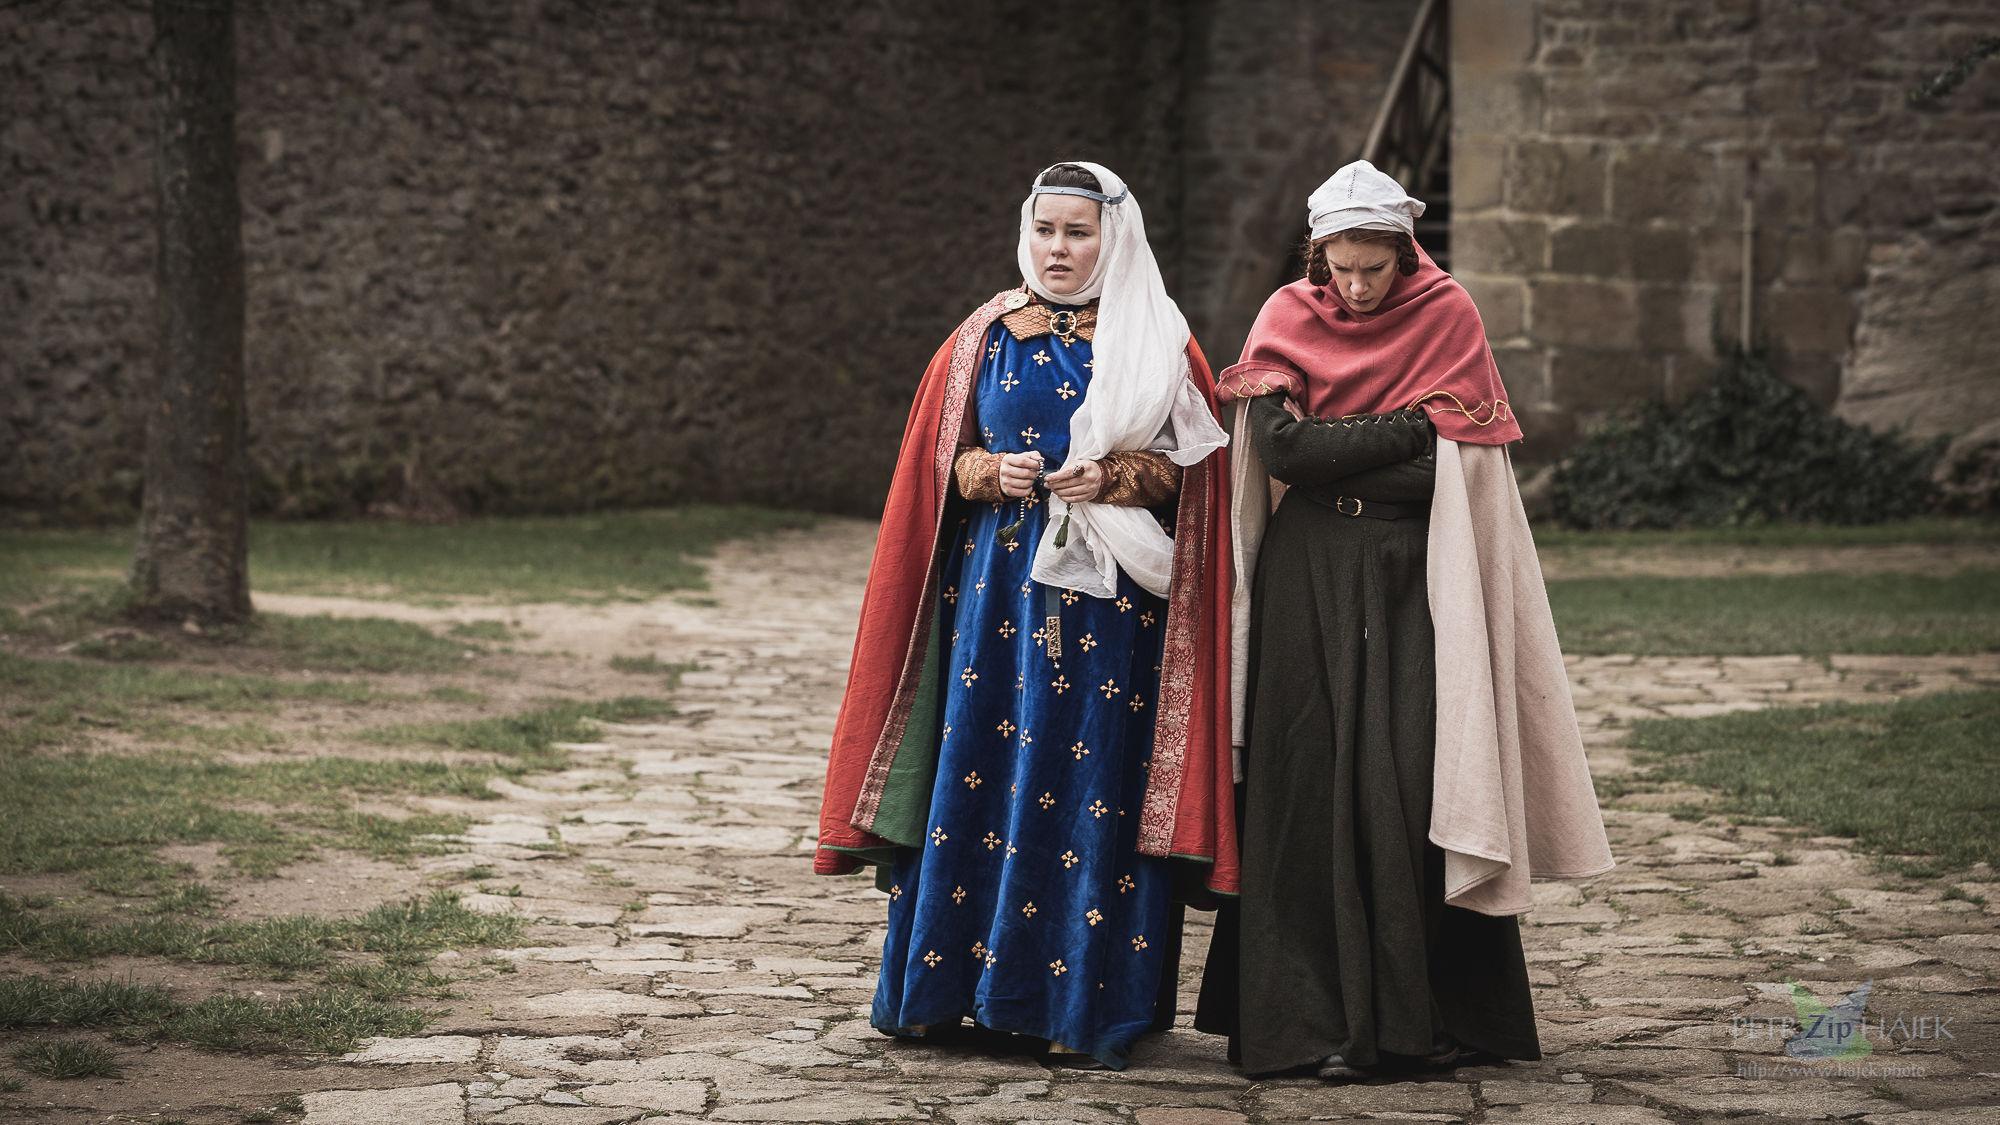 Good people of the Languedoc - Albigensiens